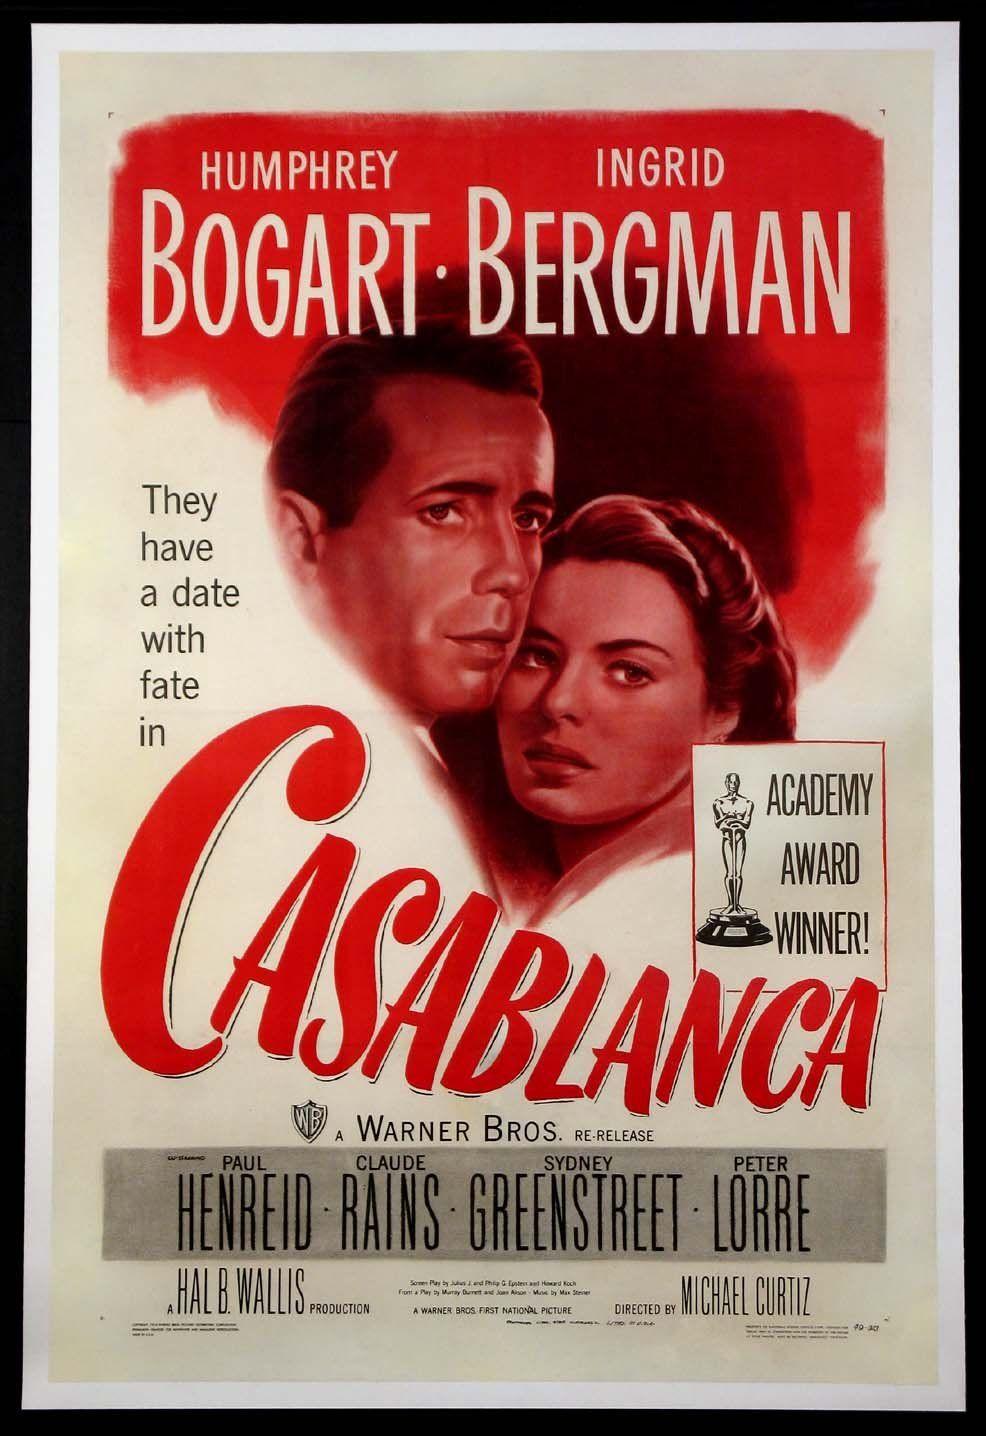 Casablanca humphrey bogart ingrid bergman r1949 vintage